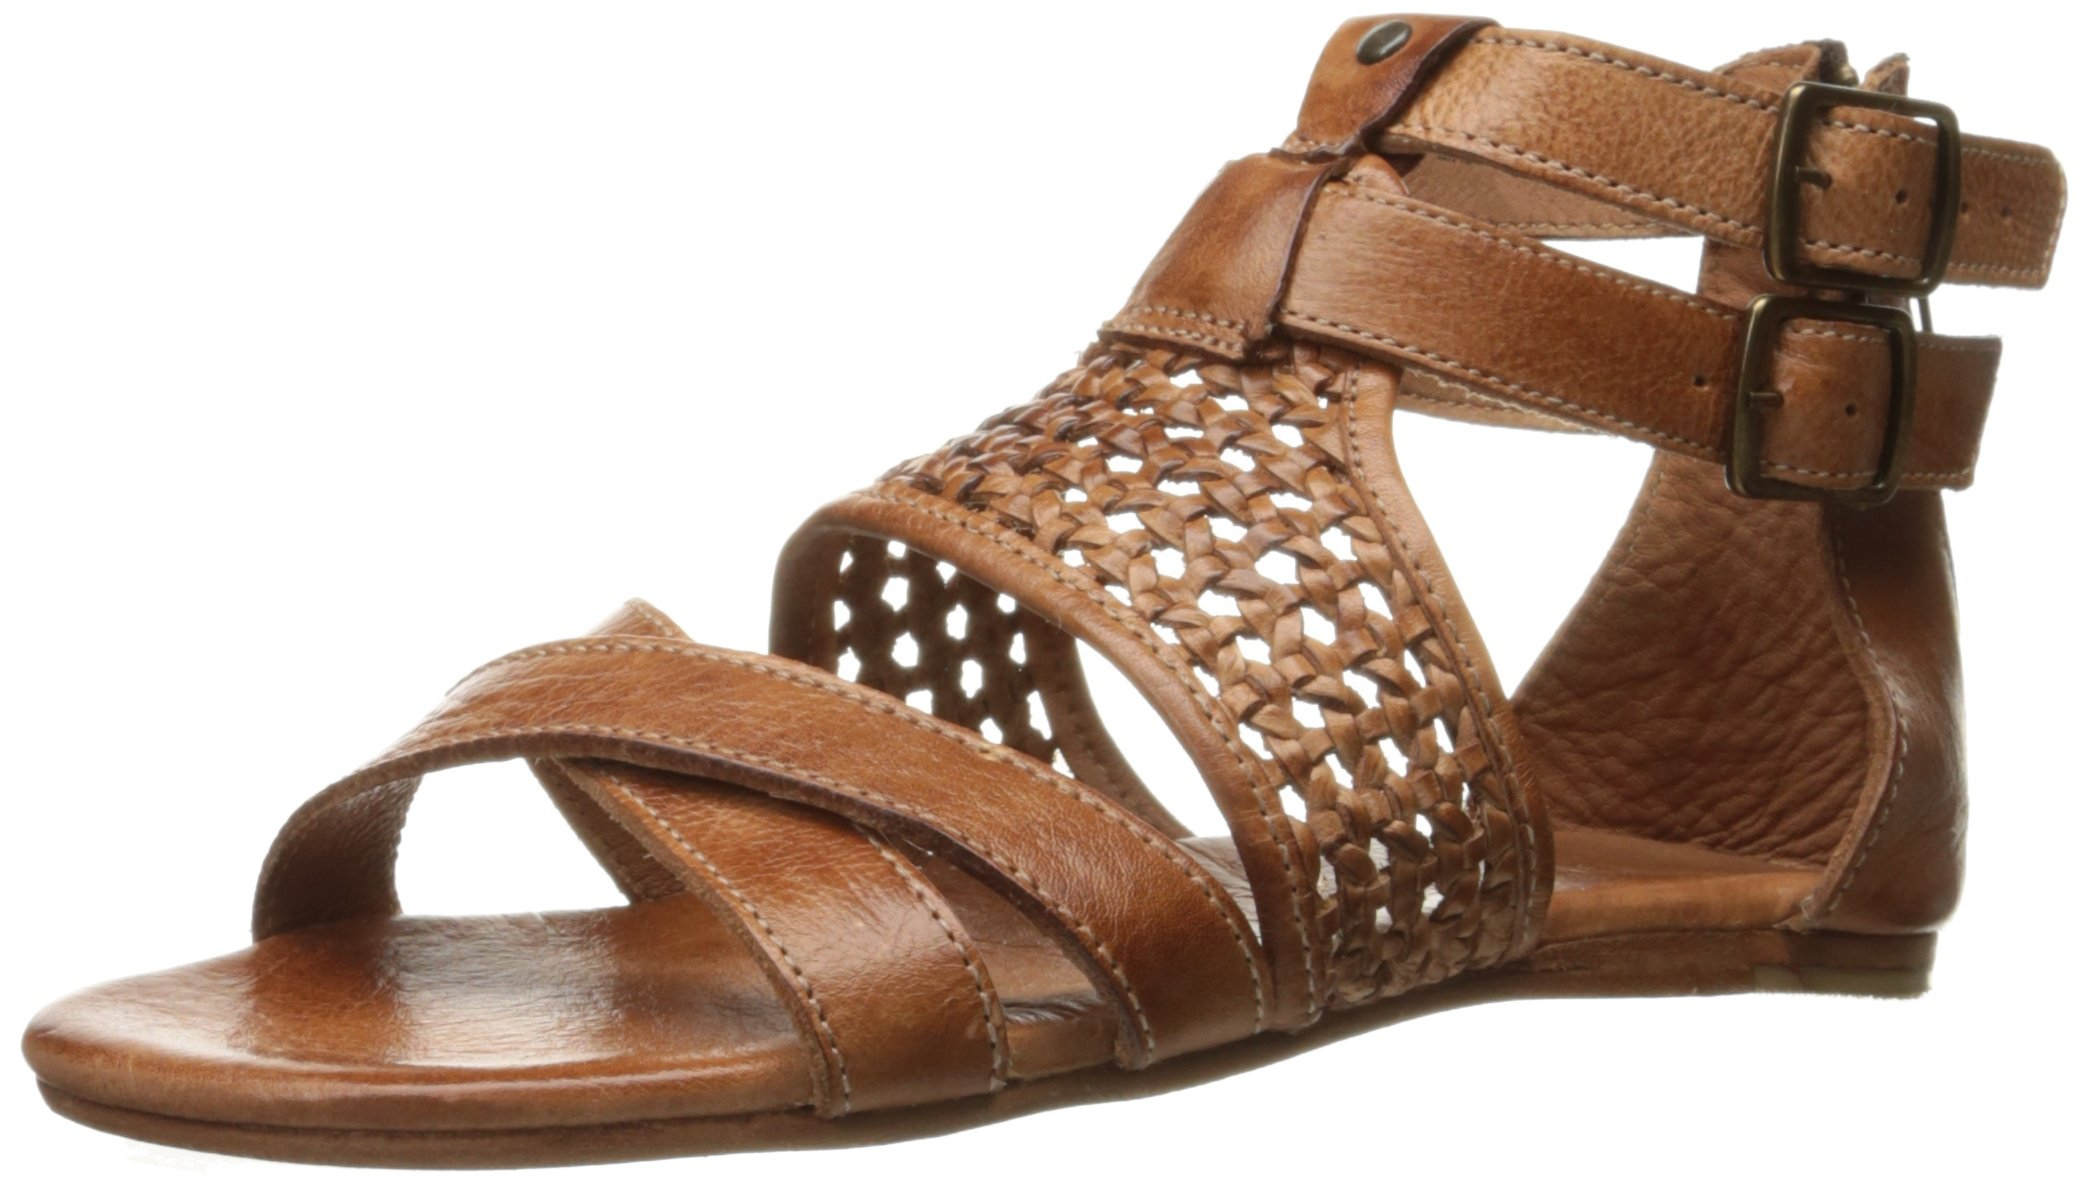 bed stu Women's Capriana Flat Sandal, Cognac Dip Dye, 7 M US